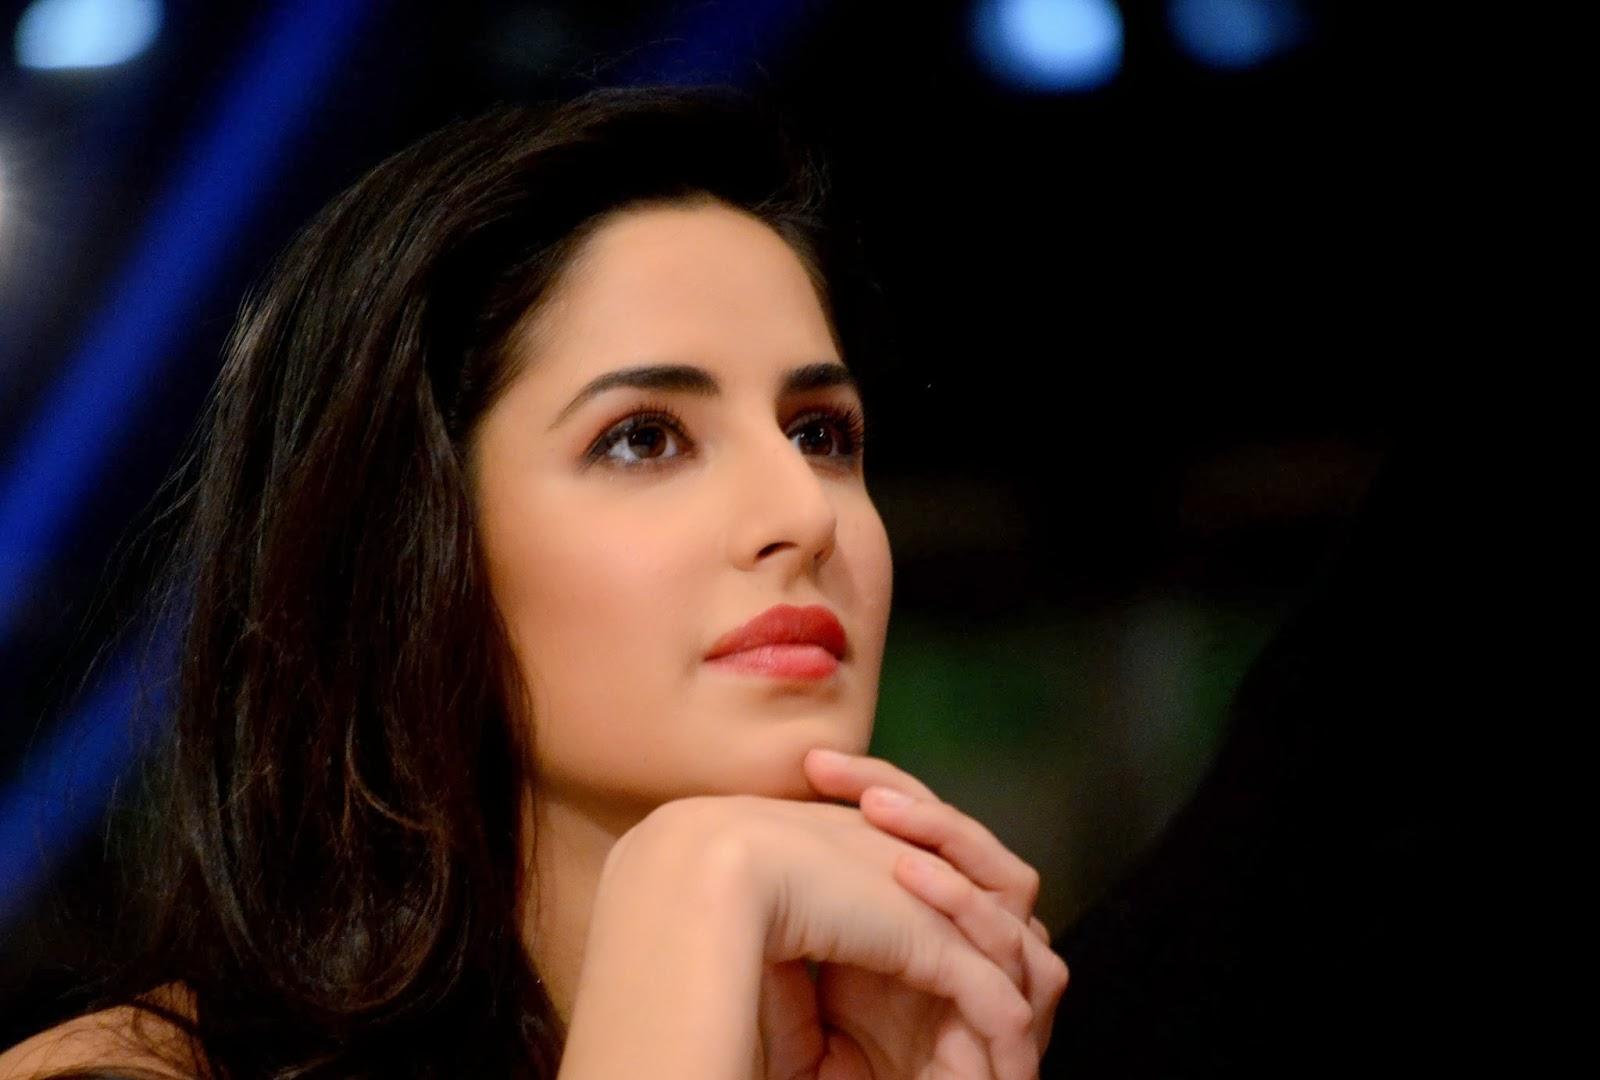 Actor, Actress, Affair, Big Star Entertainment Awards, Bollywood, Bollywood scandal, Celebrities, Cosy, Katrina Kaif, Love Affair, Mumbai, News, Ranbir Kapoor, Showbiz, Spain,